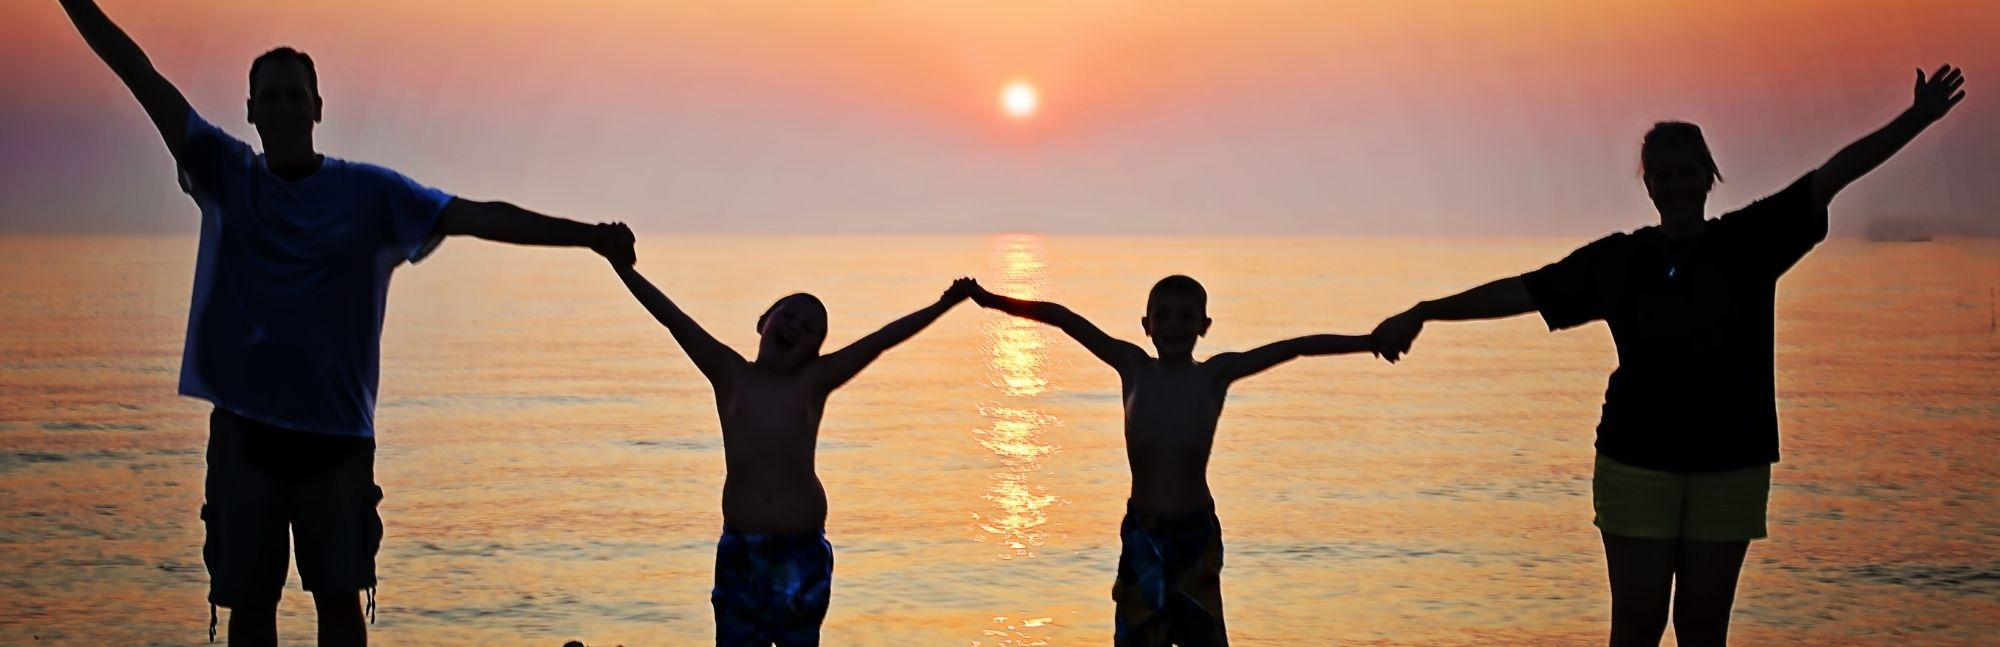 5 Family Friendly Adventures on Bowen Island